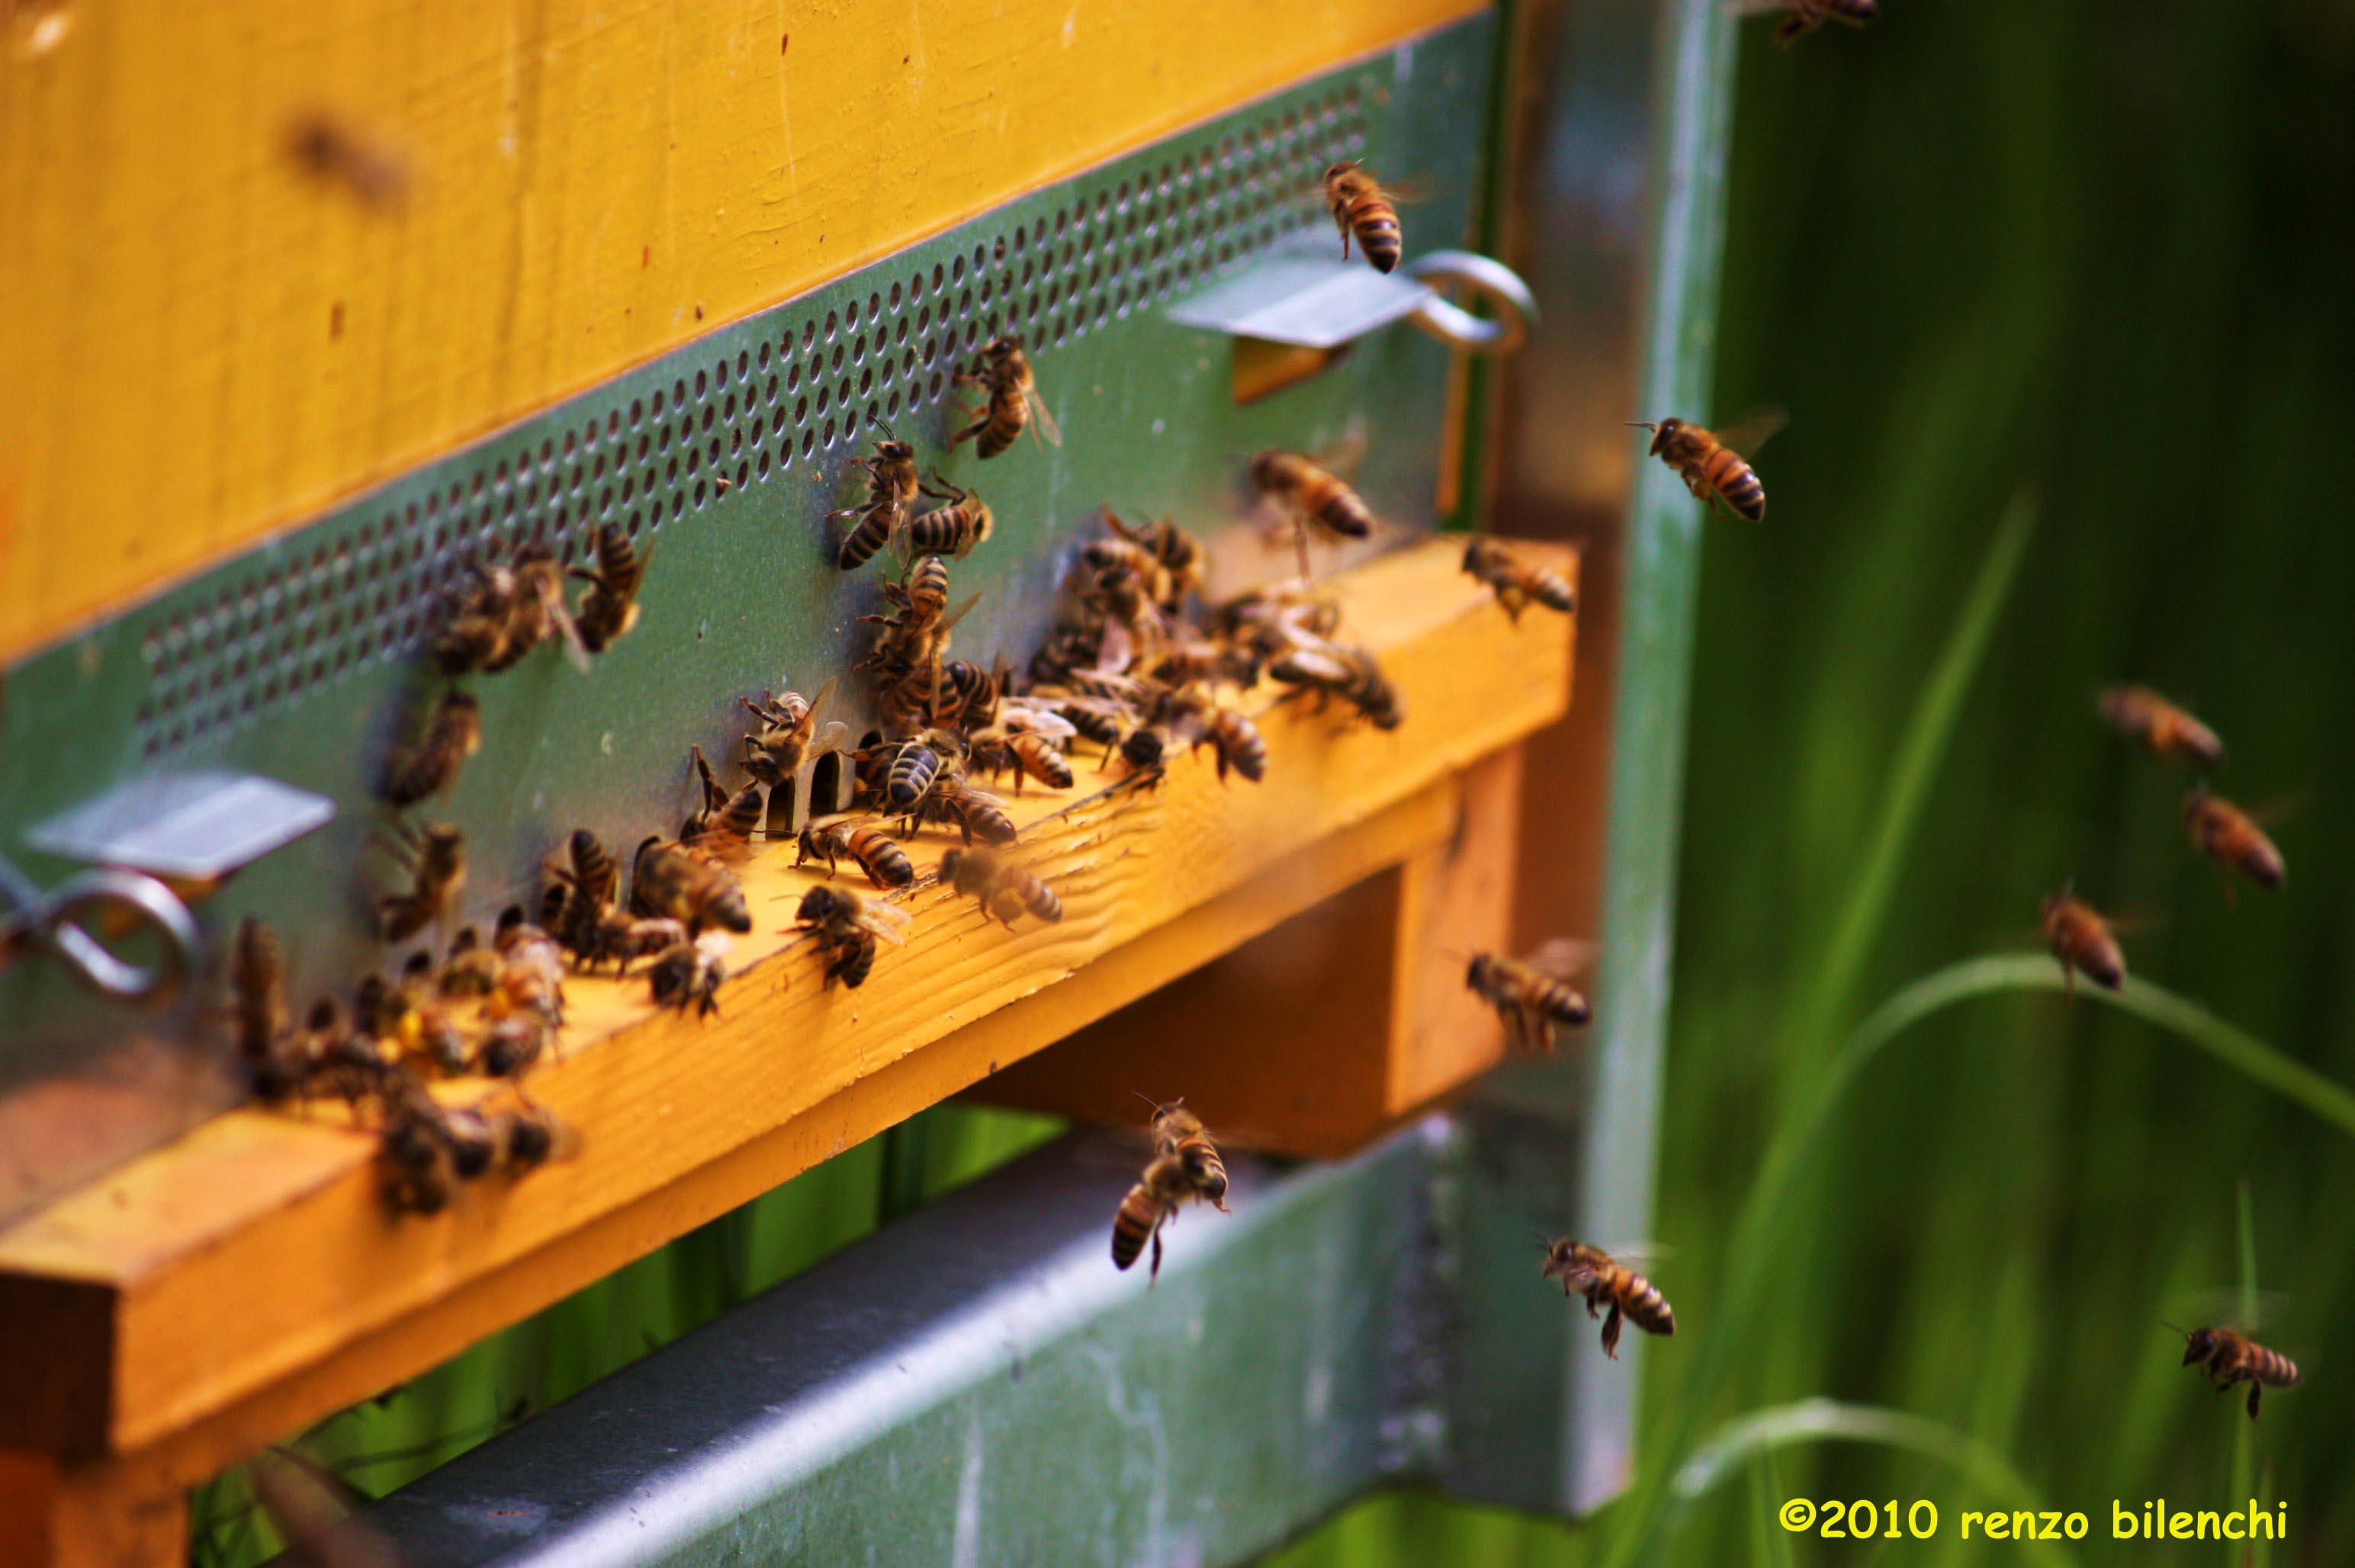 Sciame d'api spaventa turisti in fila alla Torre